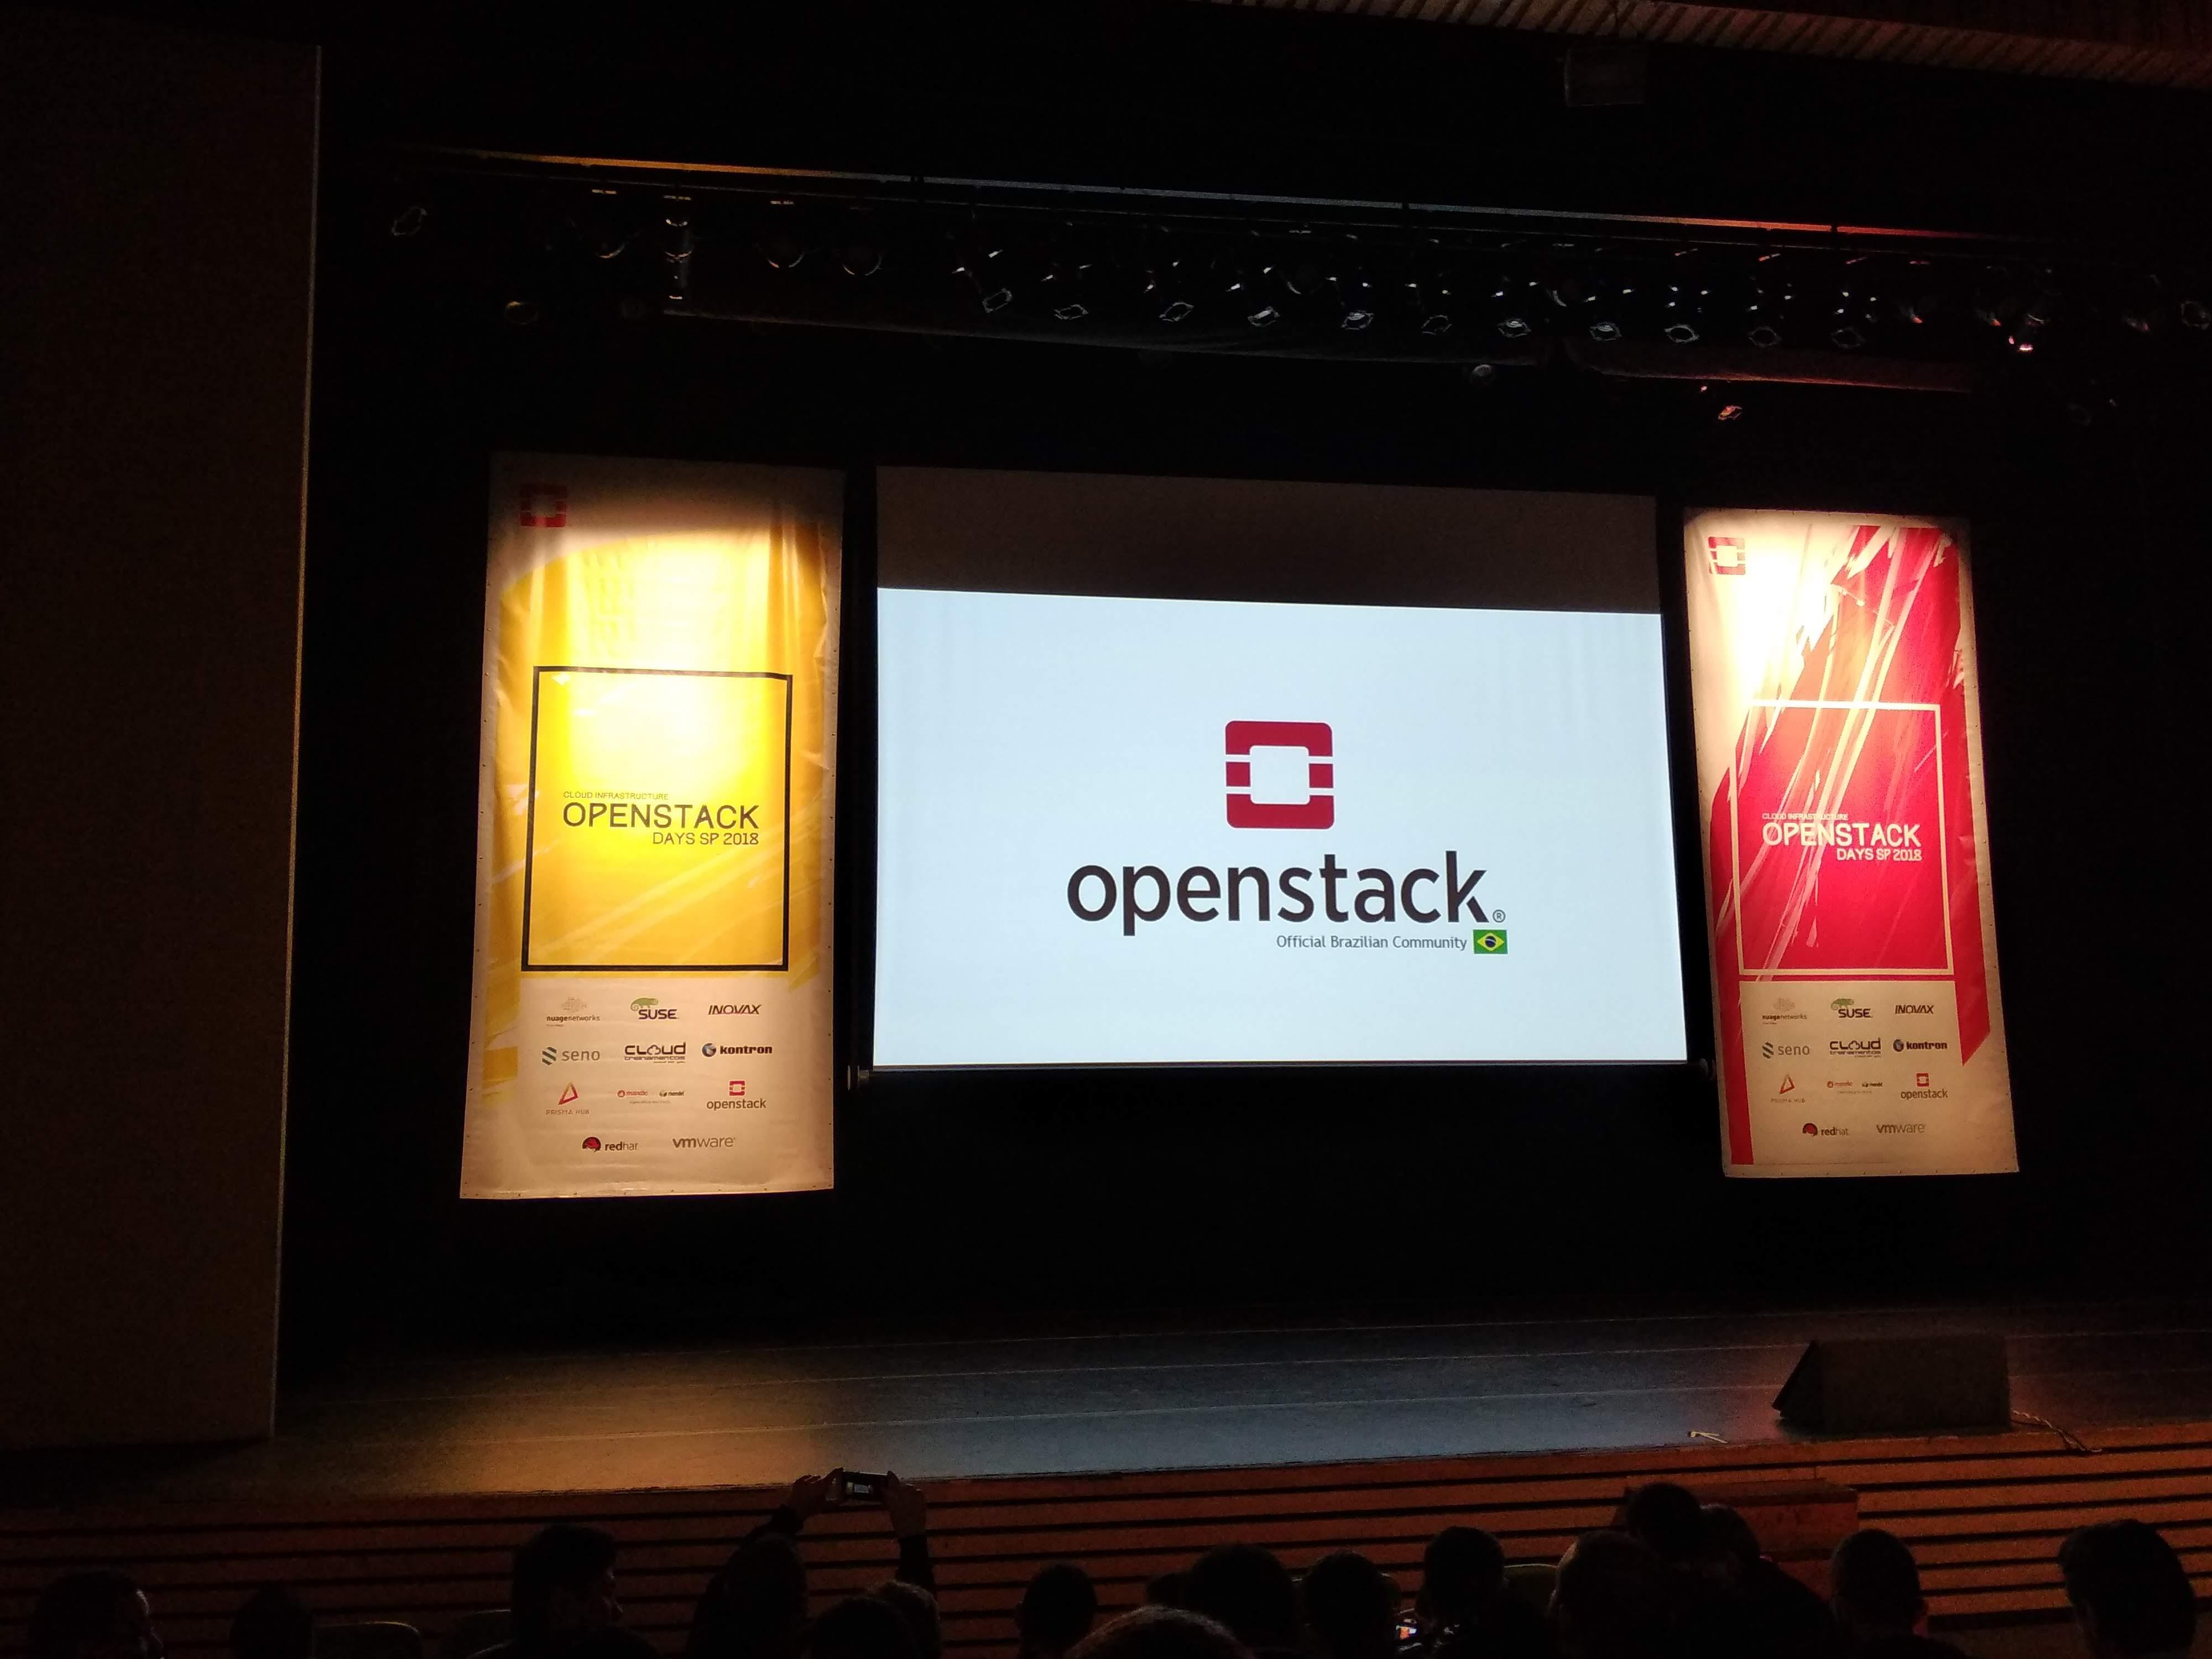 010 - Visão geral sobre Openstack new